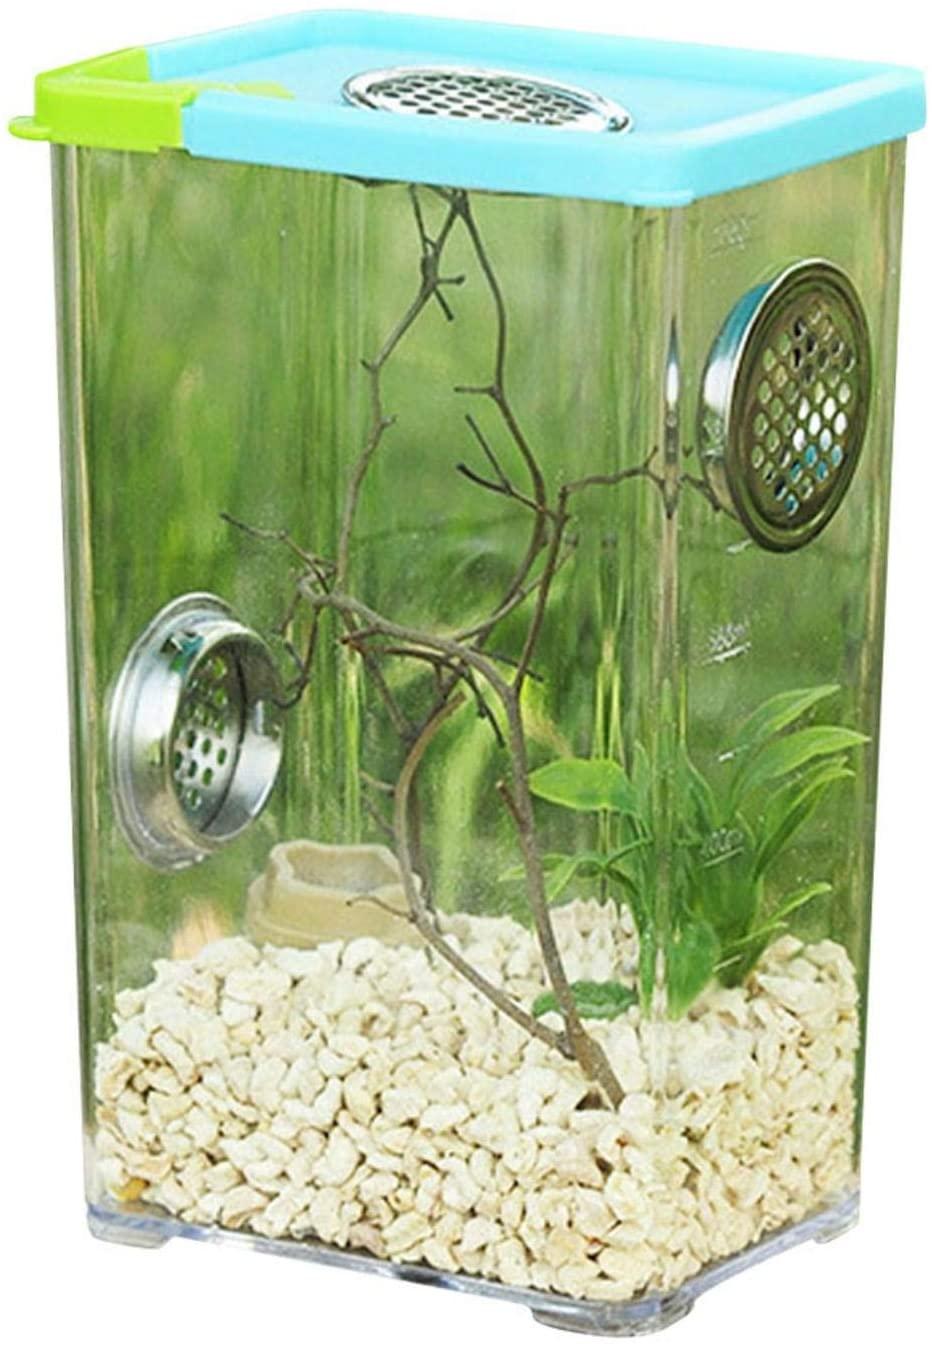 Reptile Breeding Box Acrylic Spider Scorpion Feeding Box Clear Acrylic Reptile Terrarium Feeding Box,Moisture-Proof and Heat Preservation.